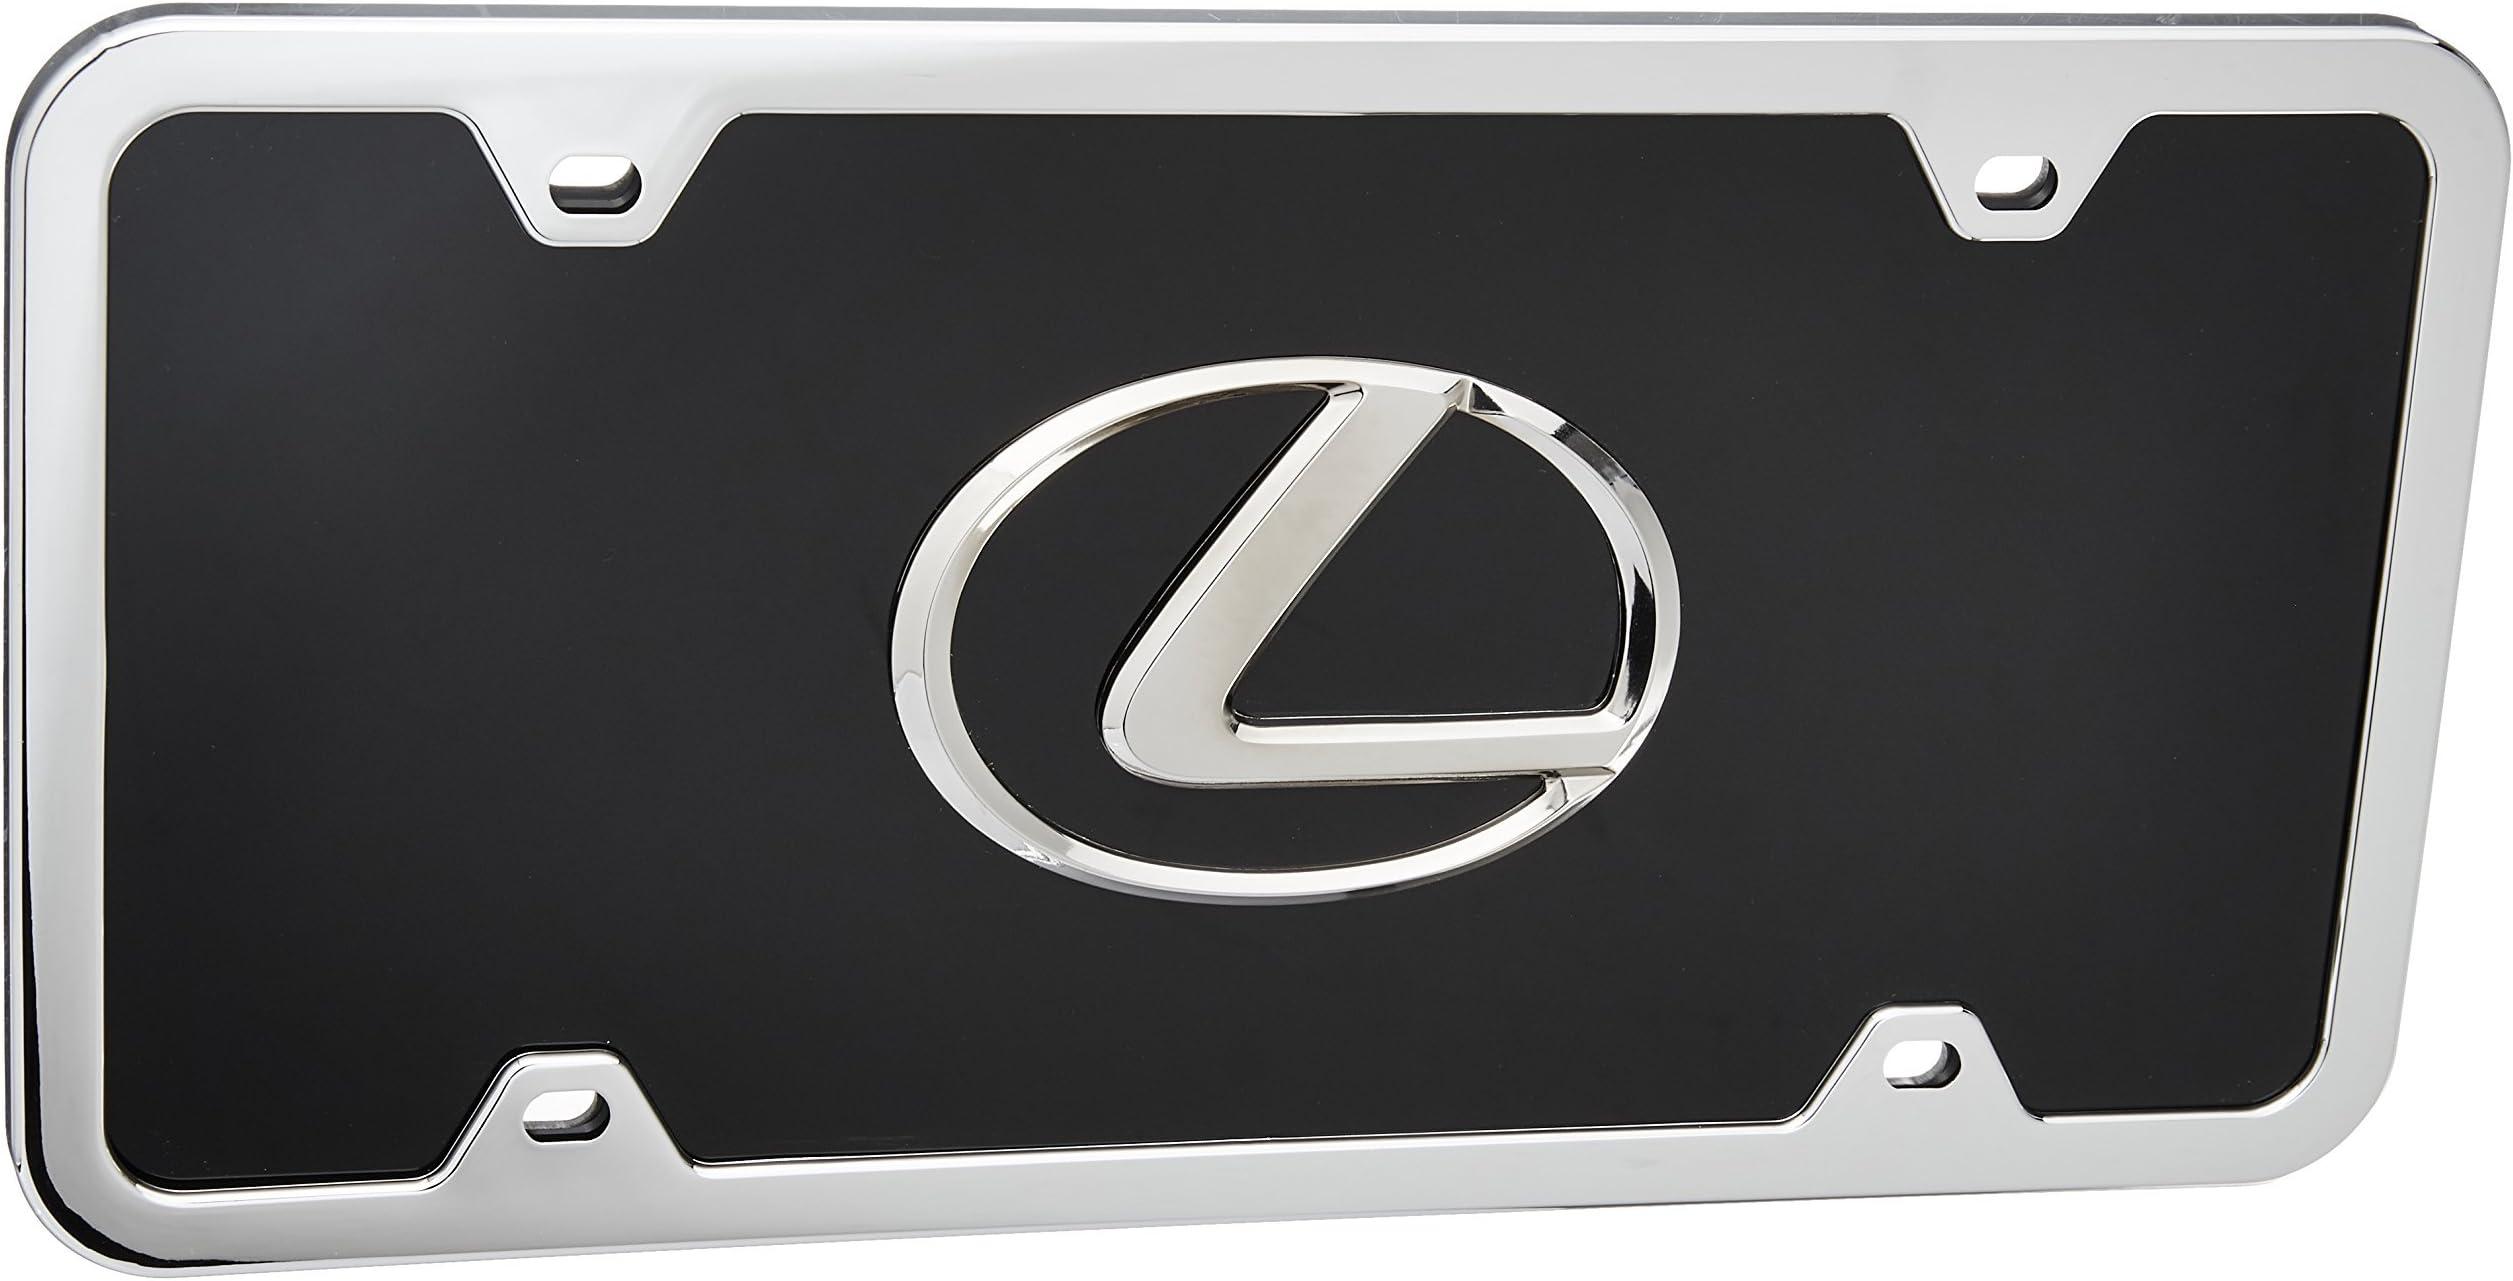 Screw Cap 1x Lexus3D Emblem STAINLESS STEEL License Plate Frame RUST FREE